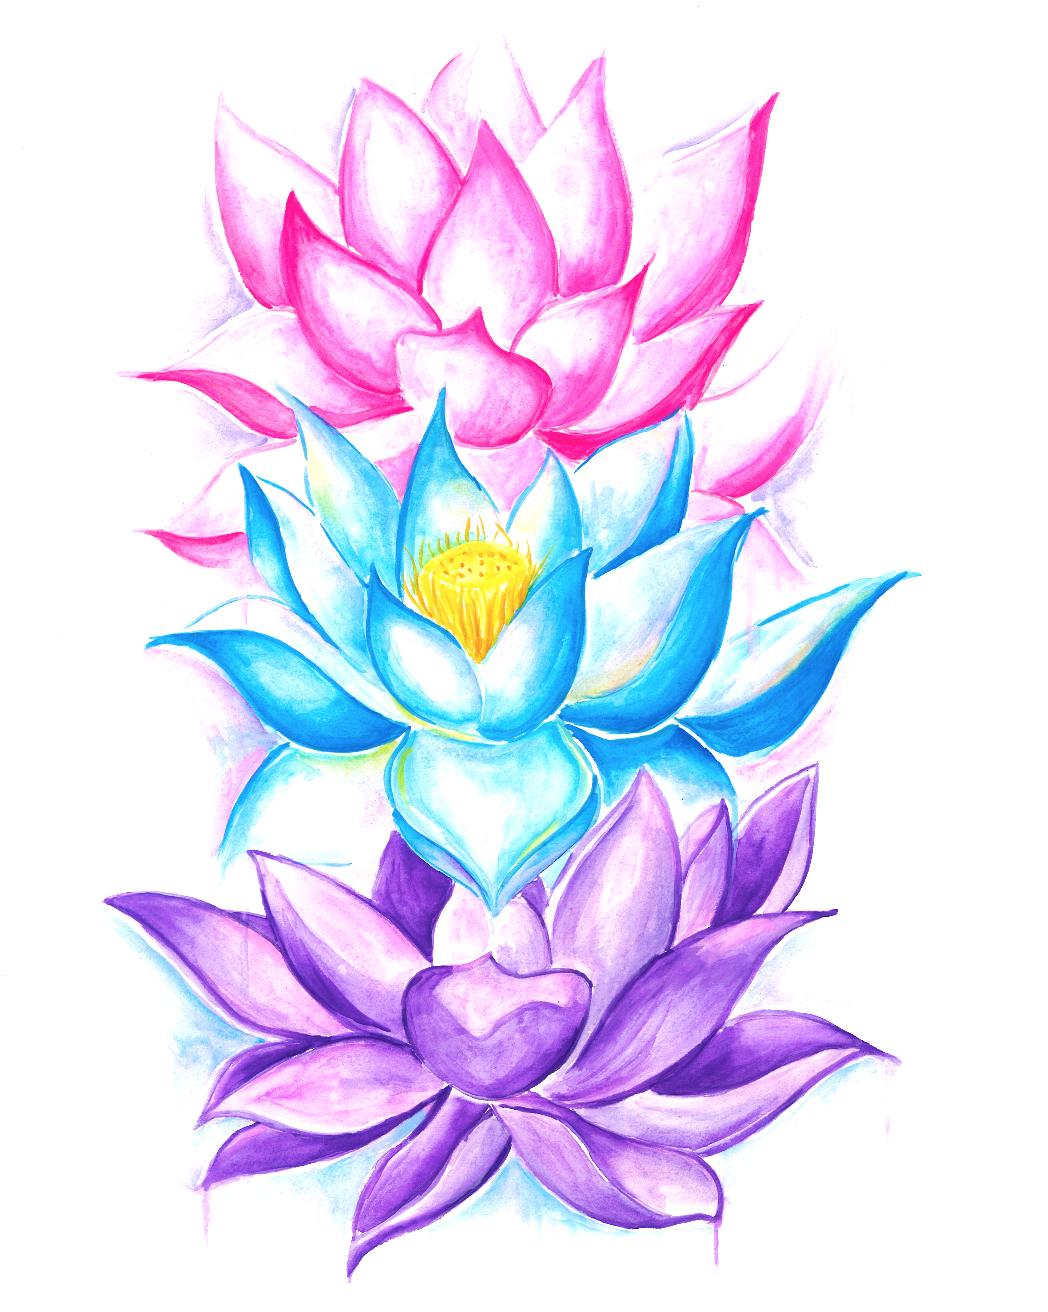 Lotus flowers pullover hoodie tattoo pinterest lotus flowers lotus flowers pullover hoodie izmirmasajfo